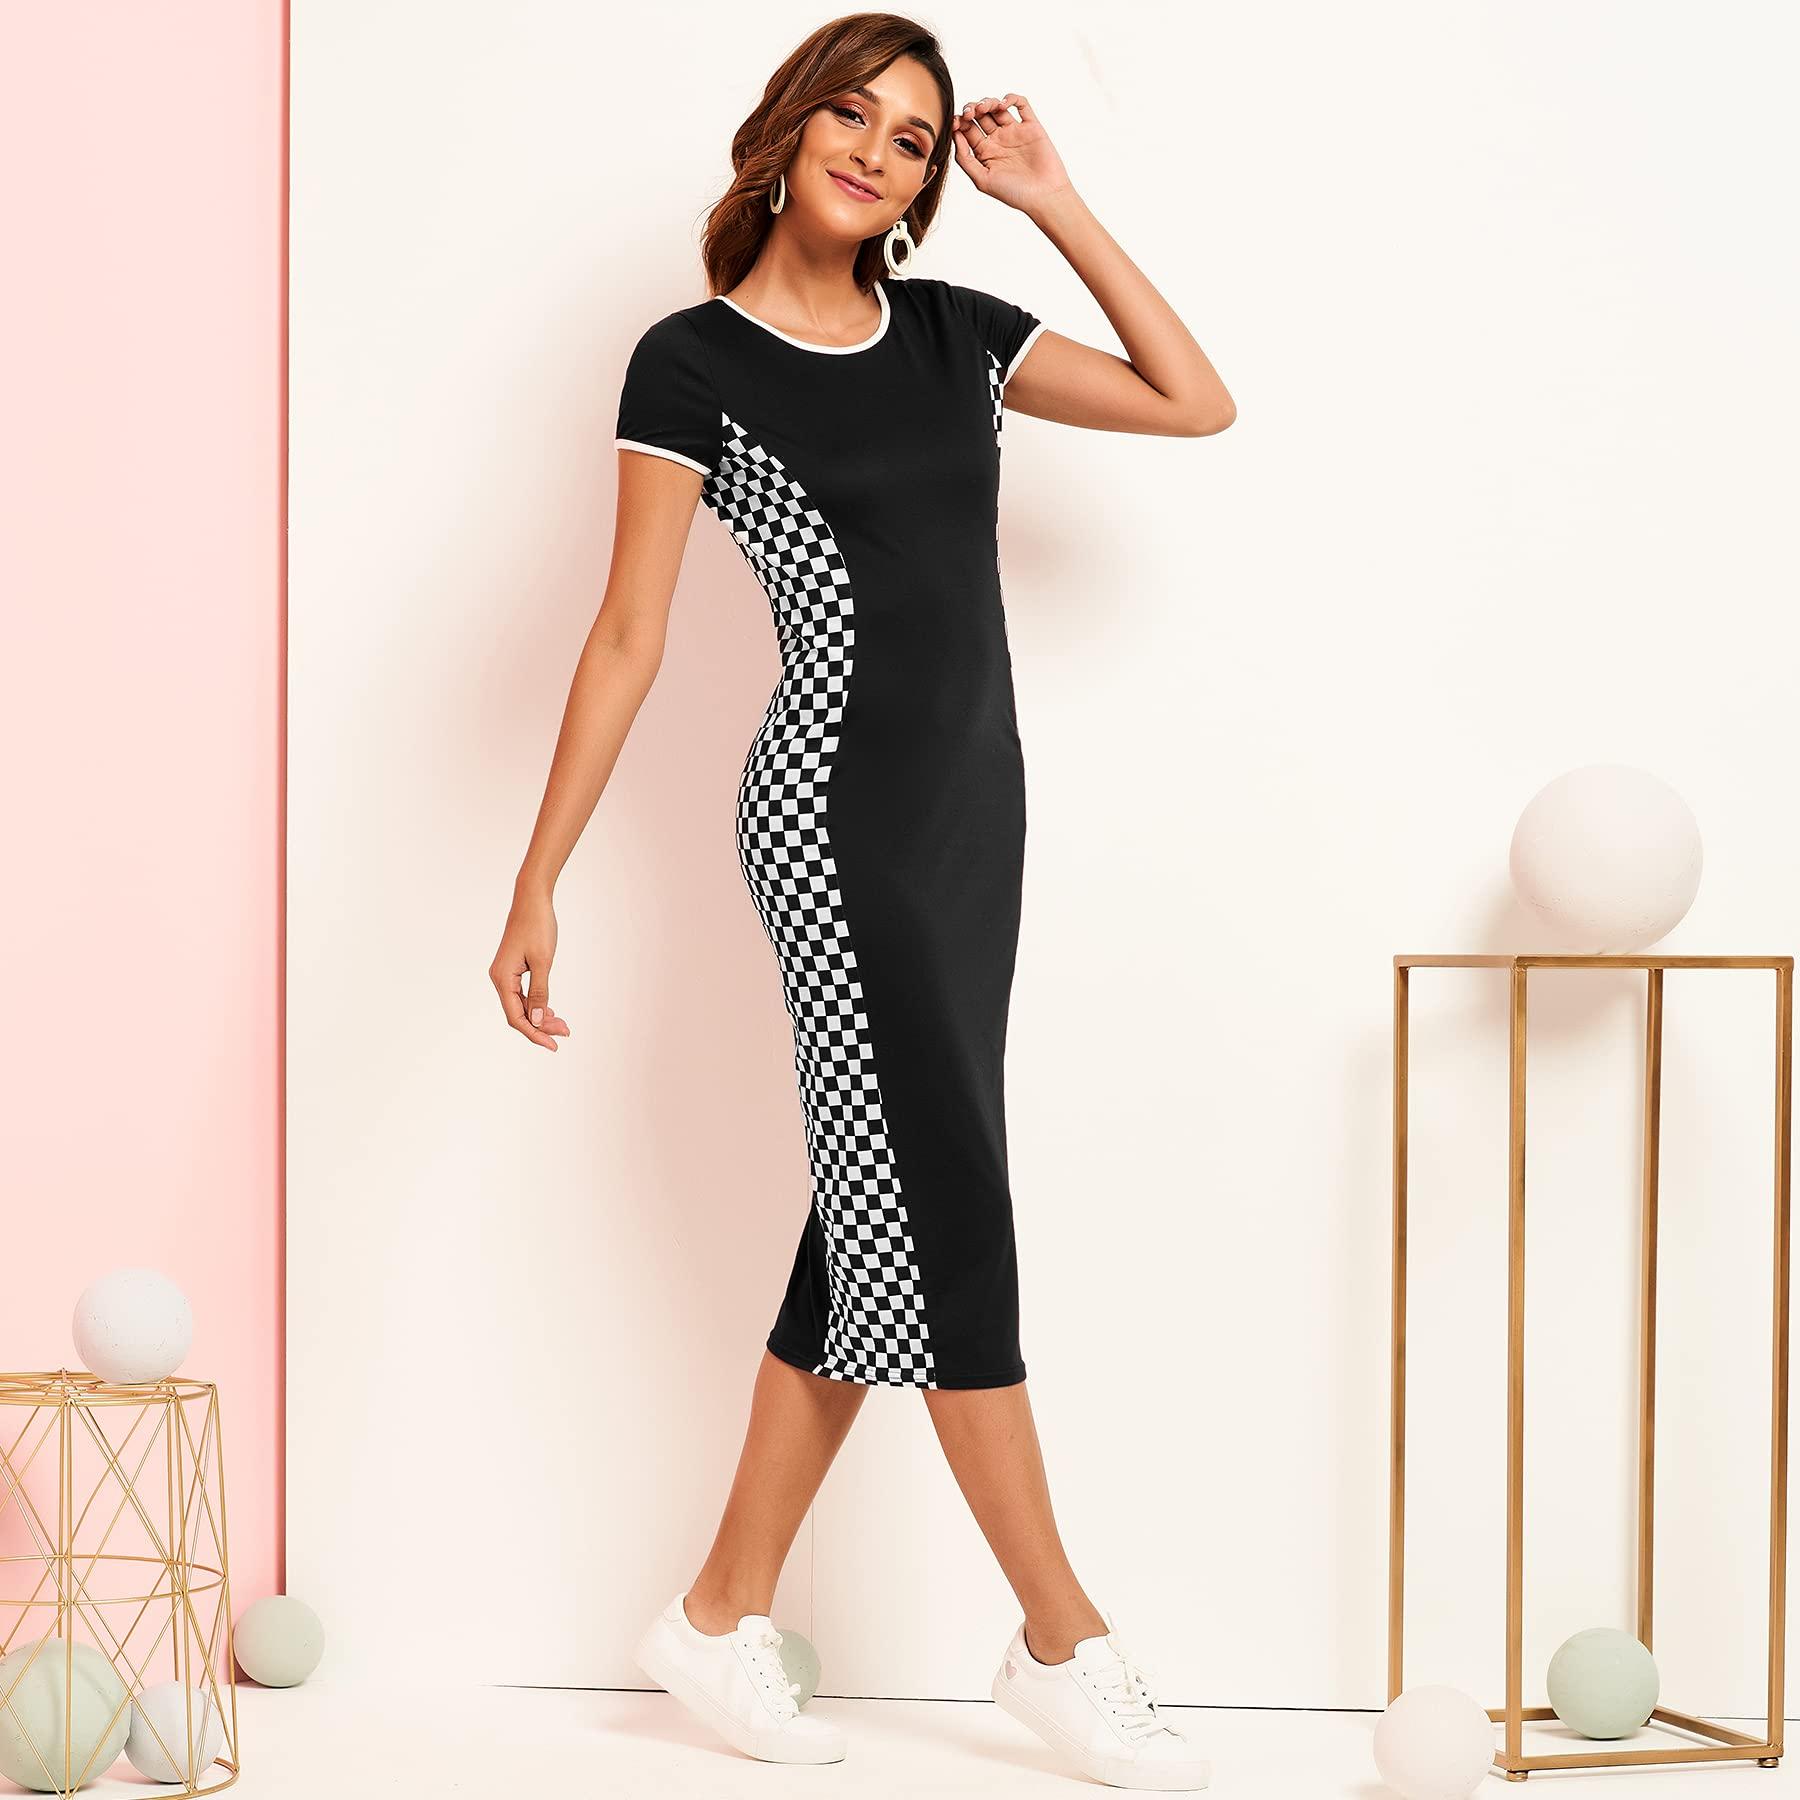 Fashion Women Dress Medi Dress Short Sleeve Tight Casual Party Beach